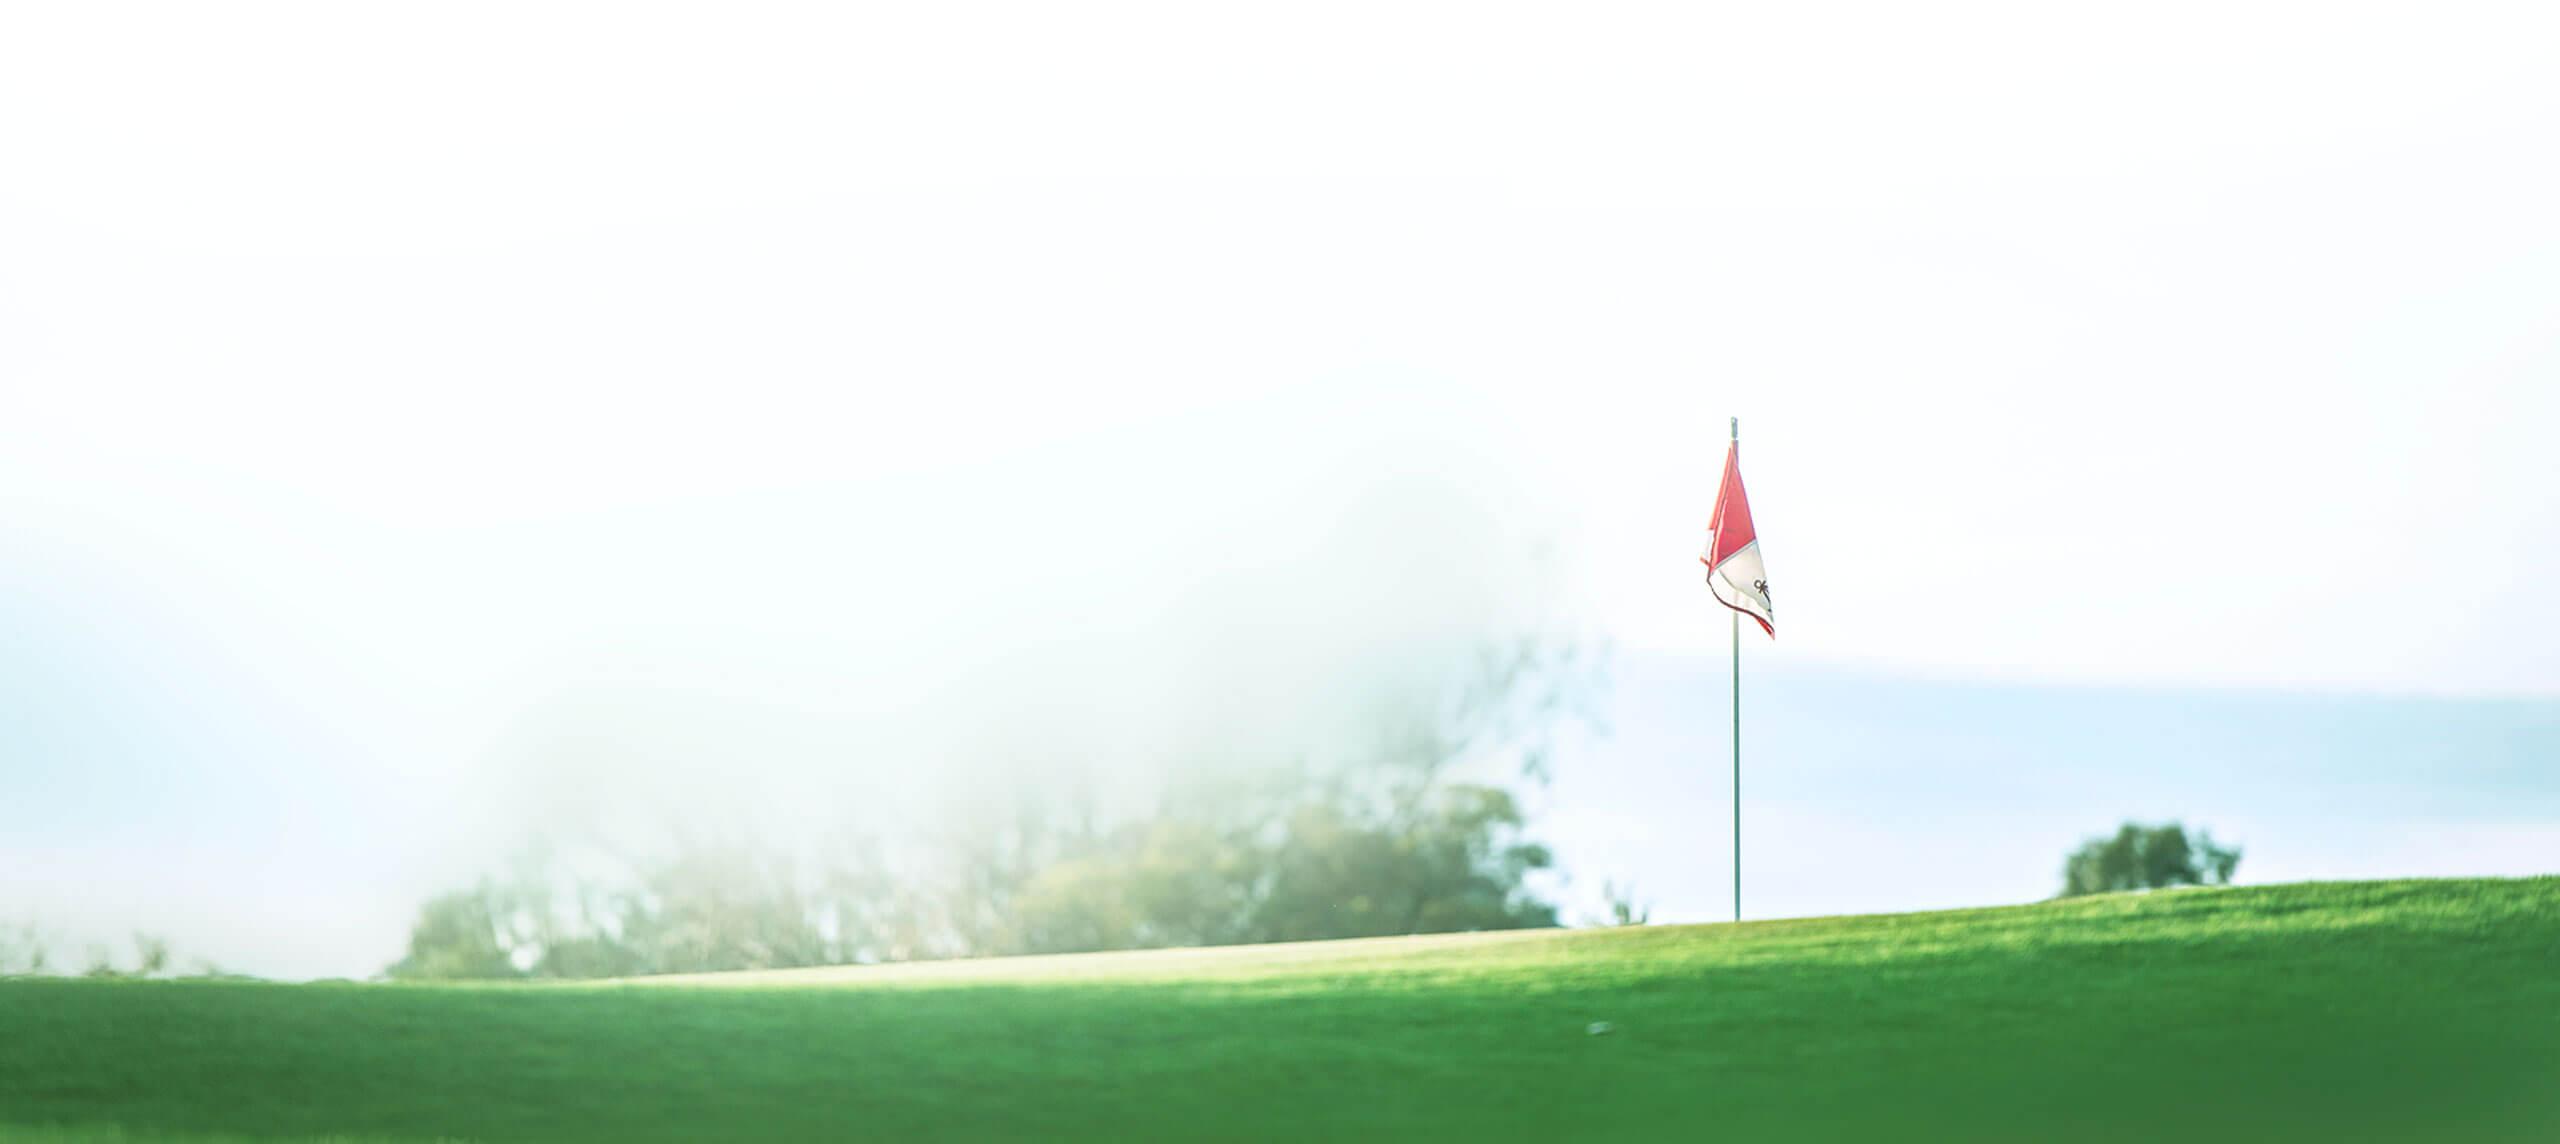 Template club de Golf